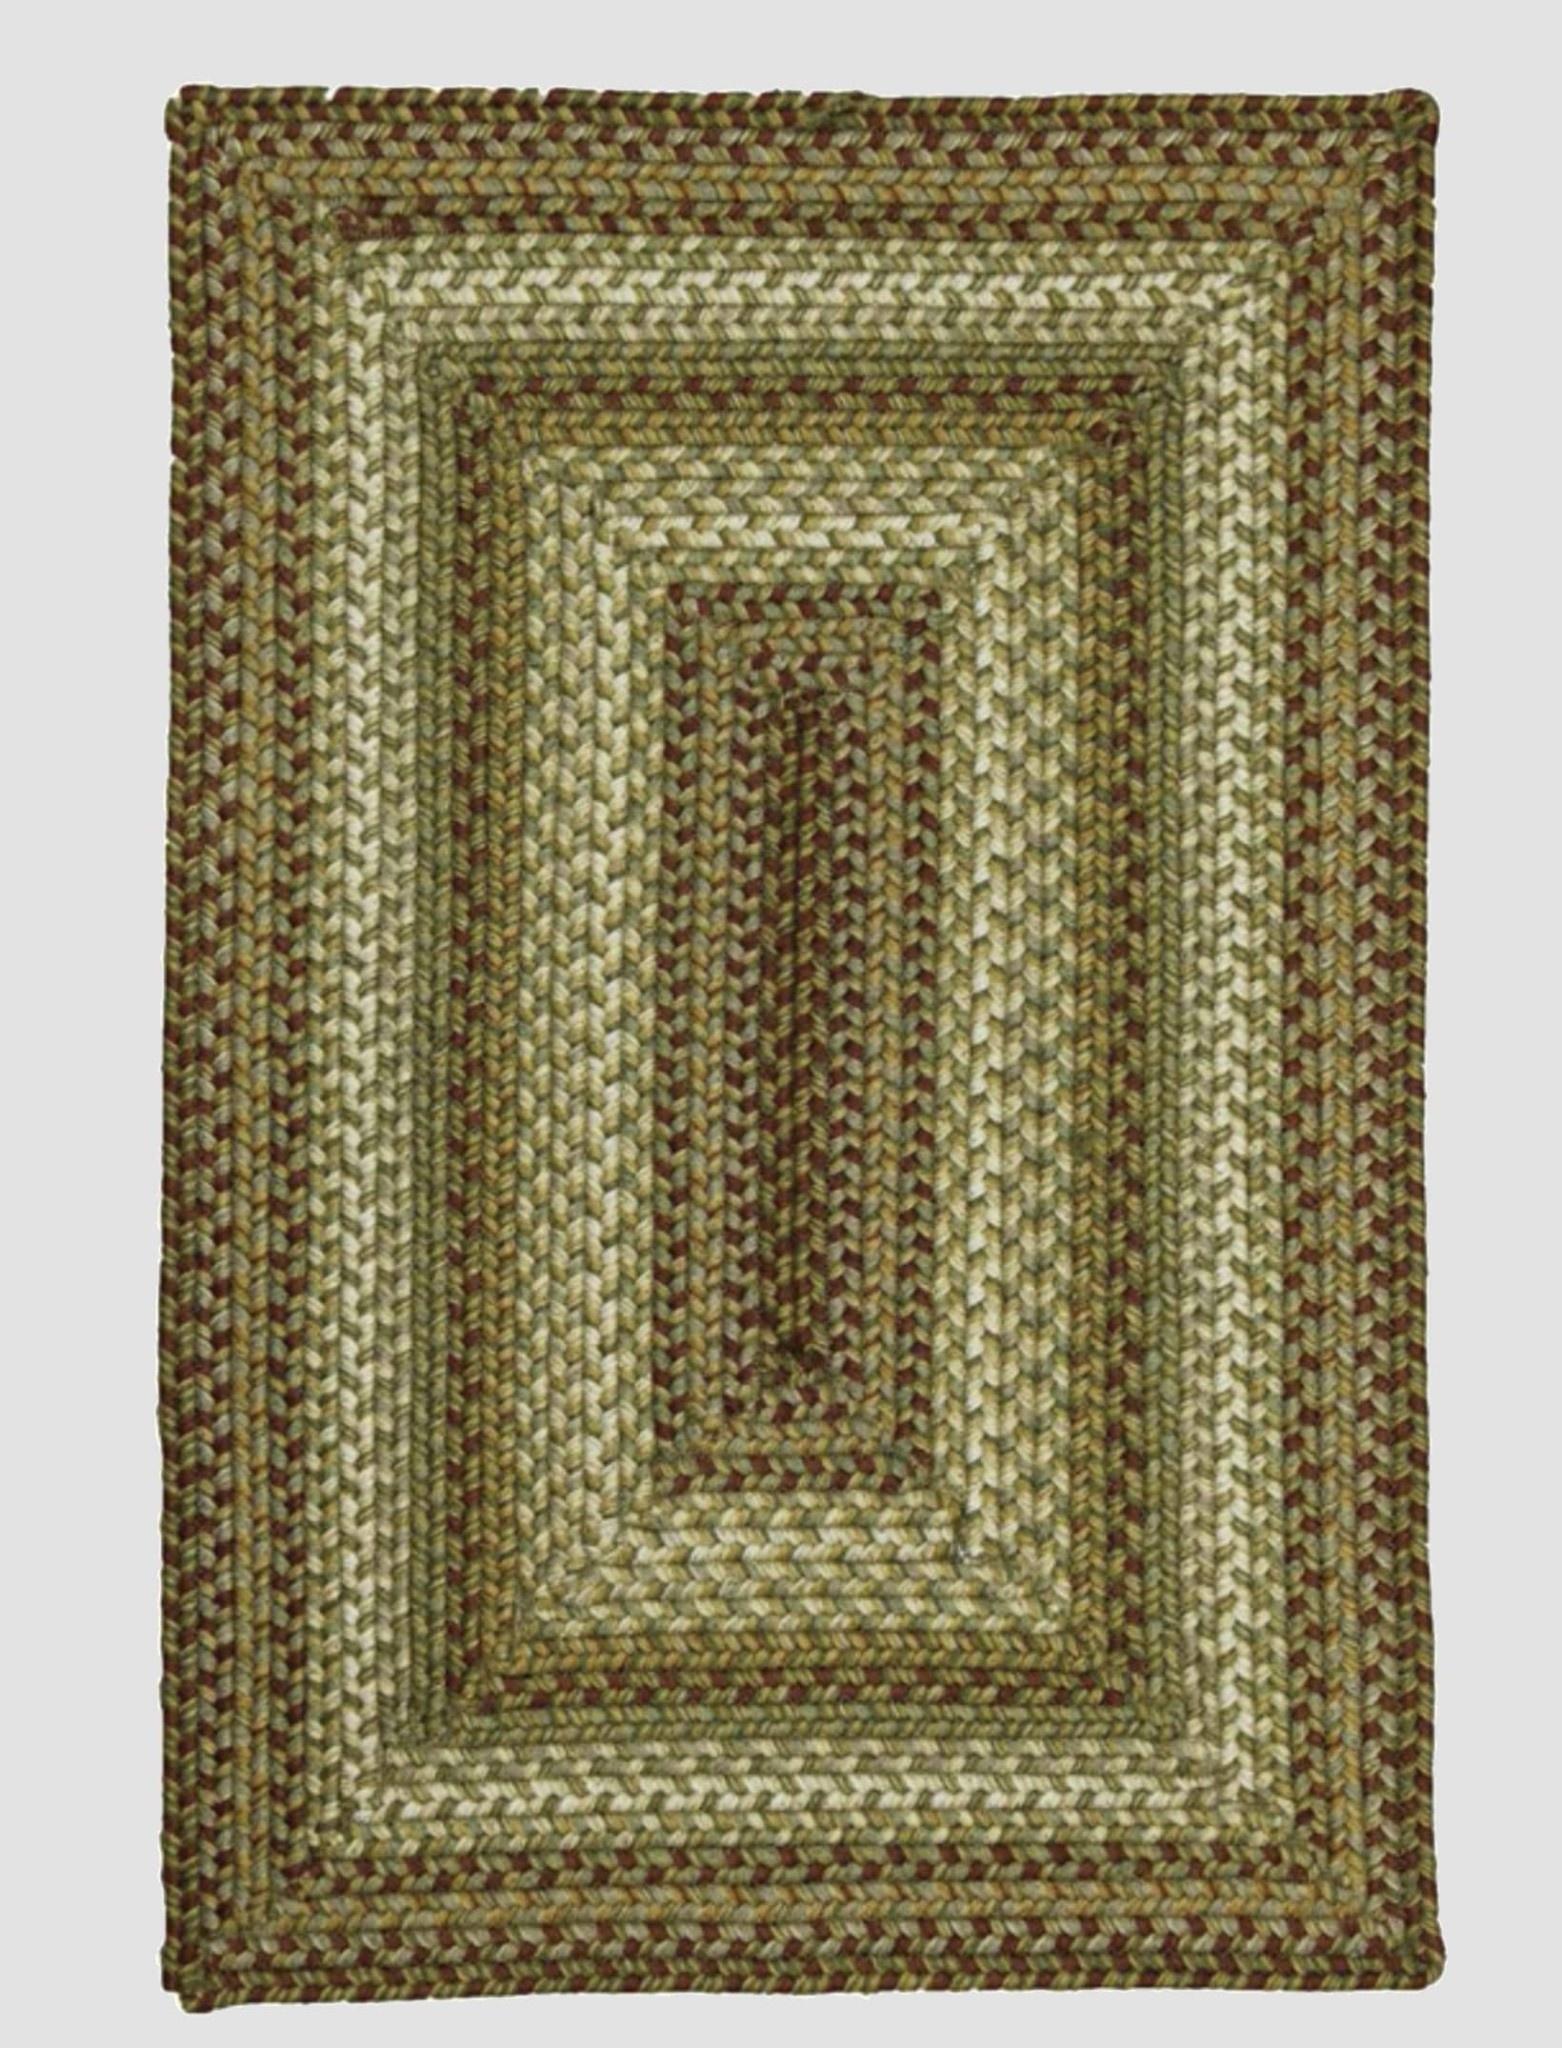 Homespice Decor Winter Wheat Ultra Wool Braided Rug - Rectangle